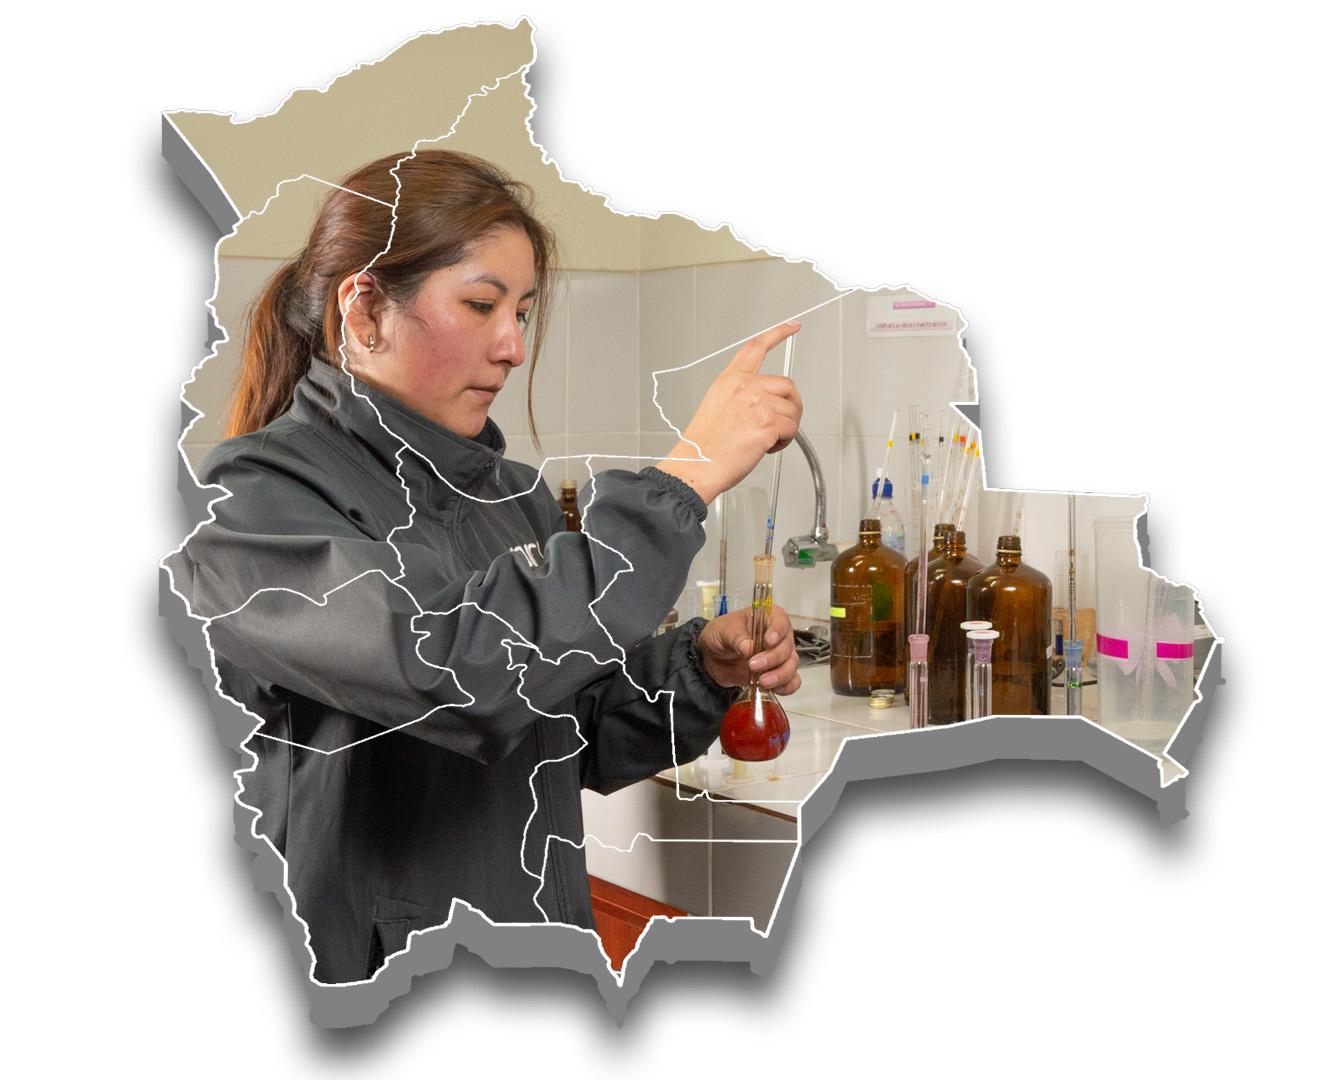 Mapa de Bolivia con mujer con pipeta haciendo experiments